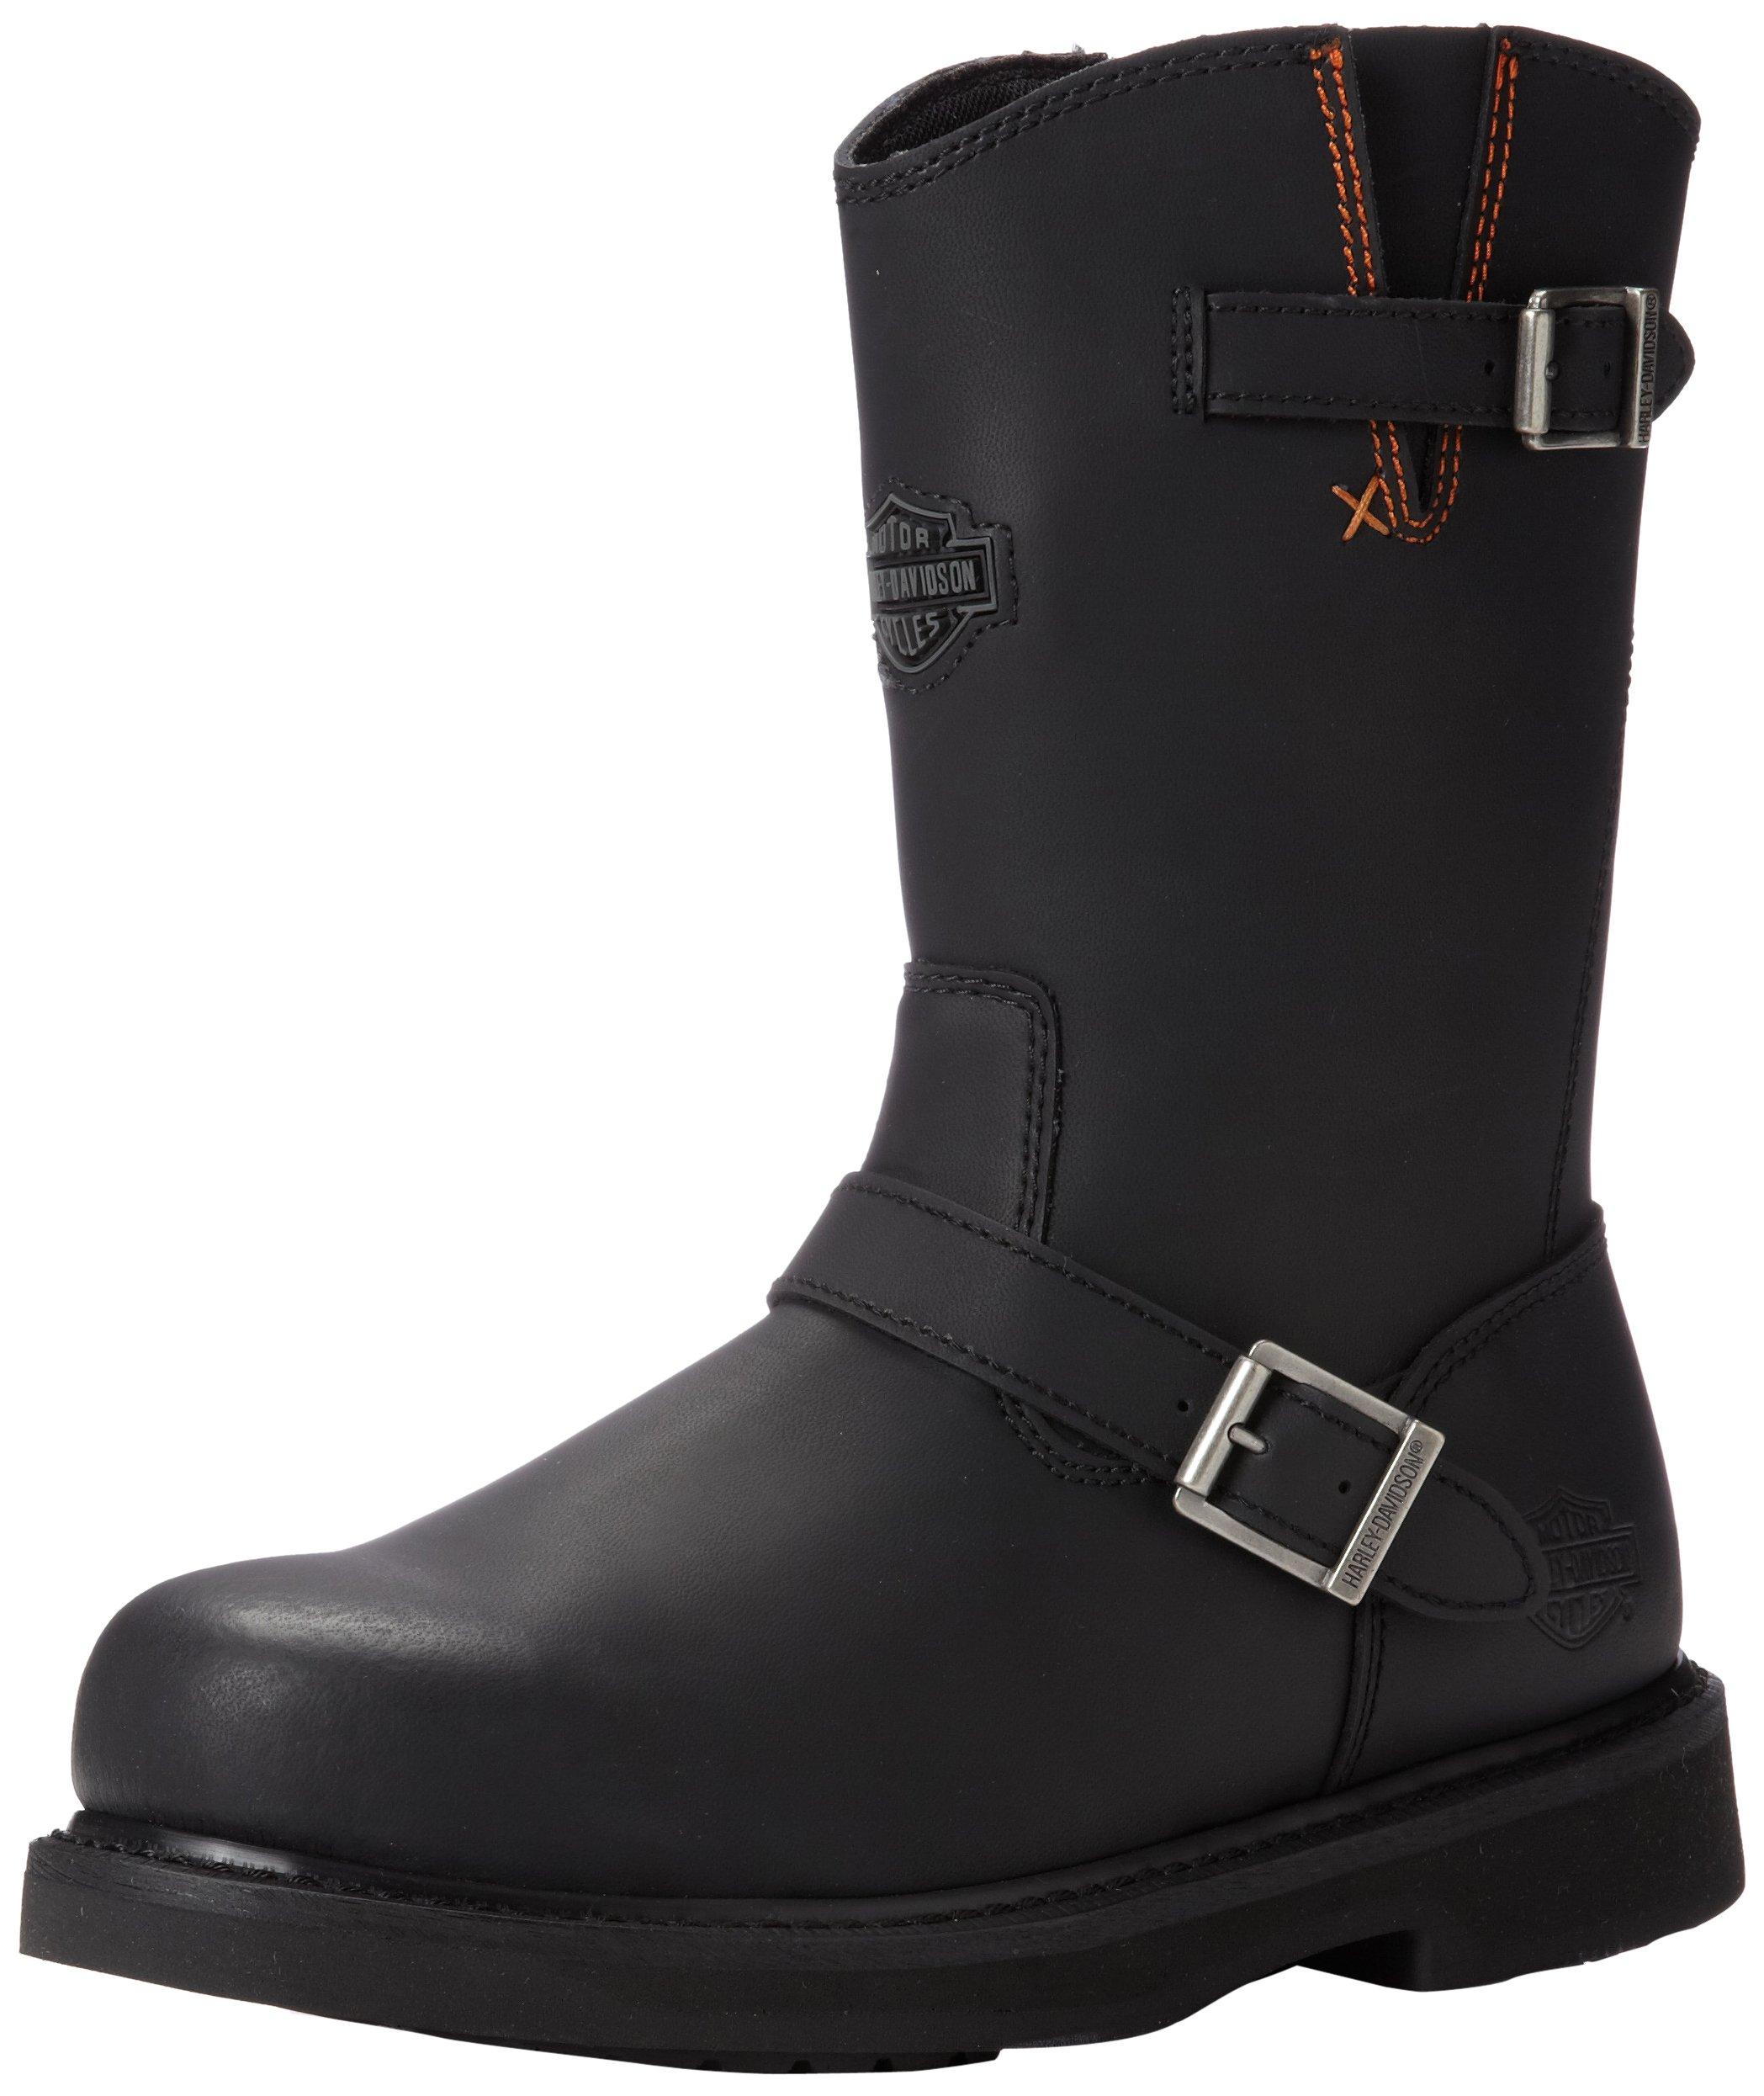 Harley-Davidson Men's Jason ST Engineer Safety Boot, Black, 8 M US